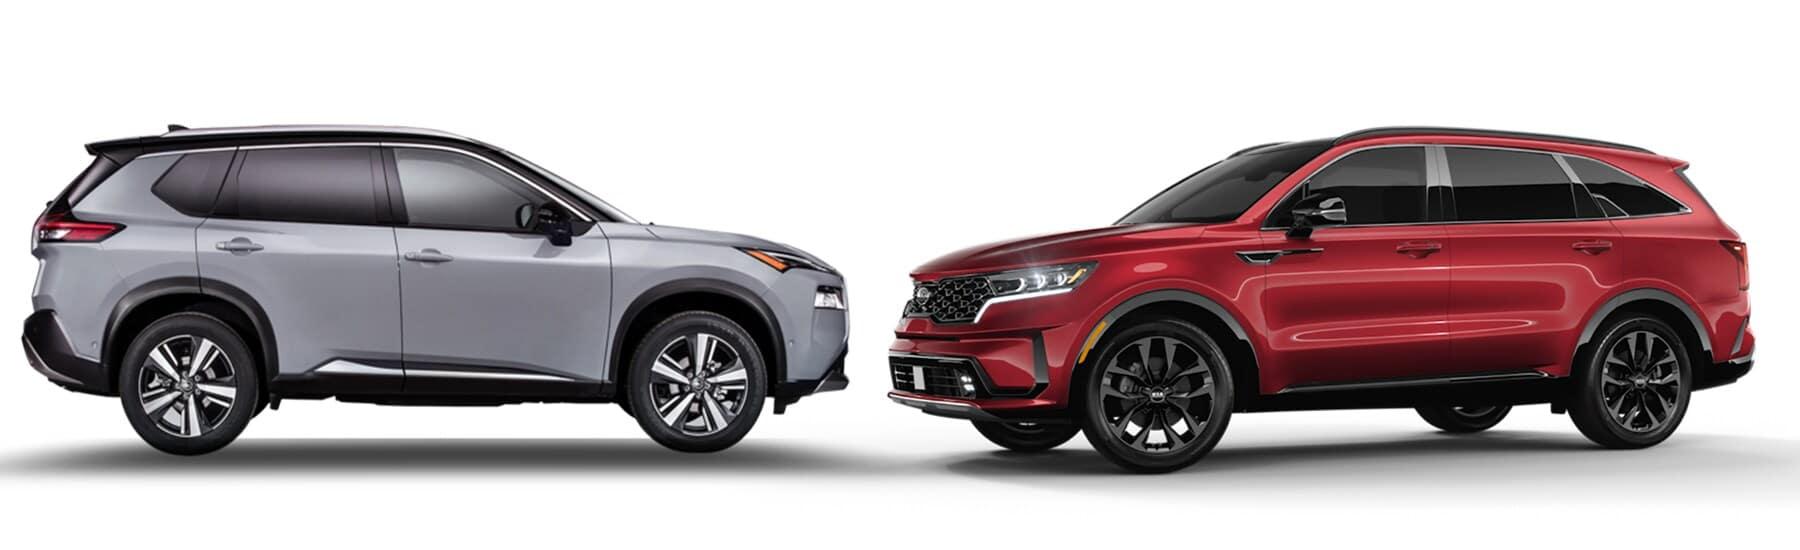 Sorento-vs-Nissan-rogue